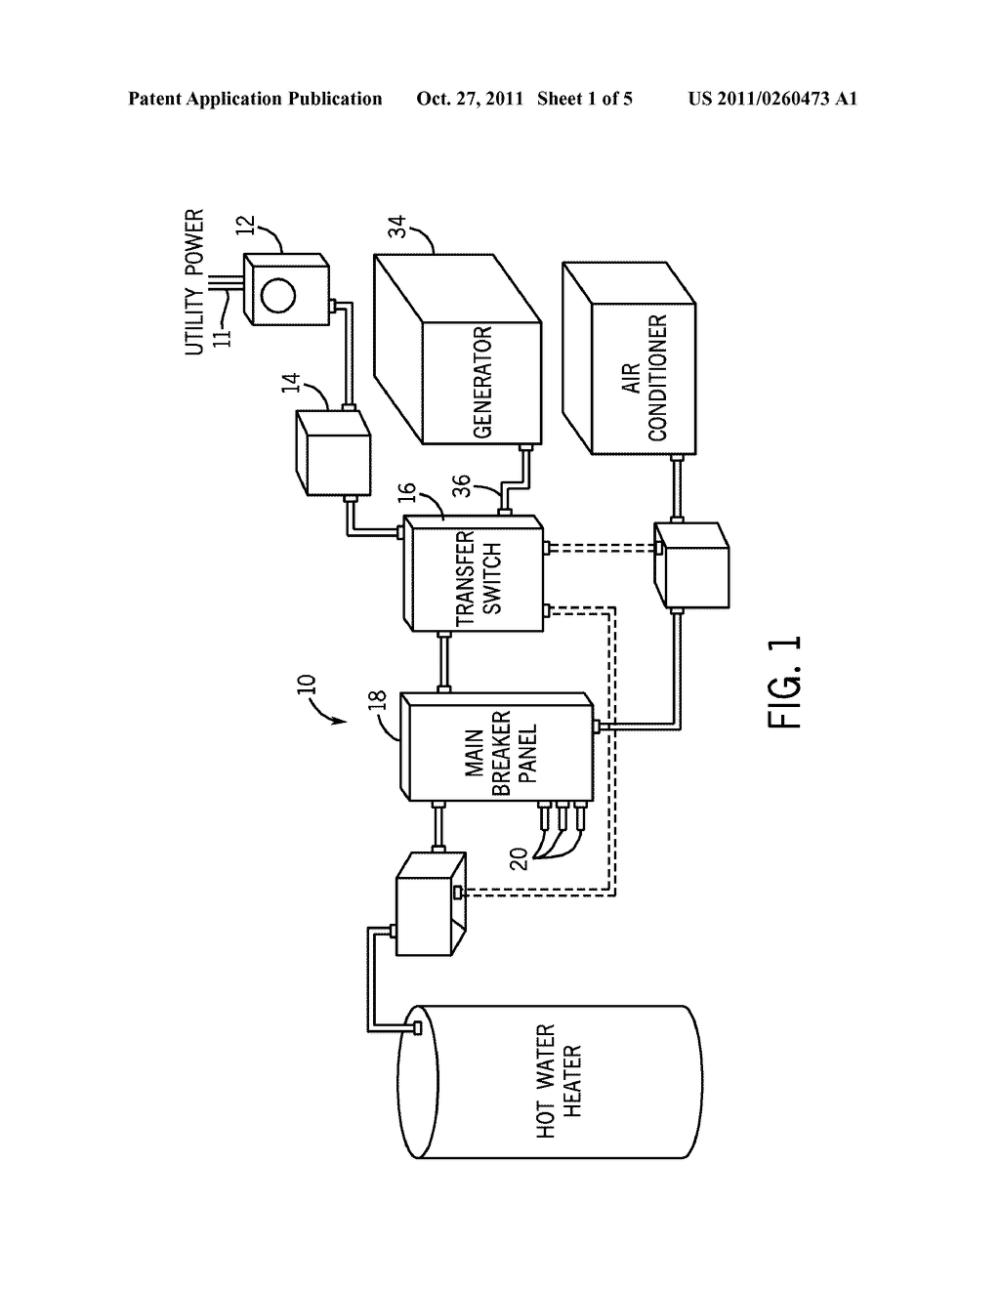 medium resolution of backup generator diagram wiring diagram emergency generator wiring diagram